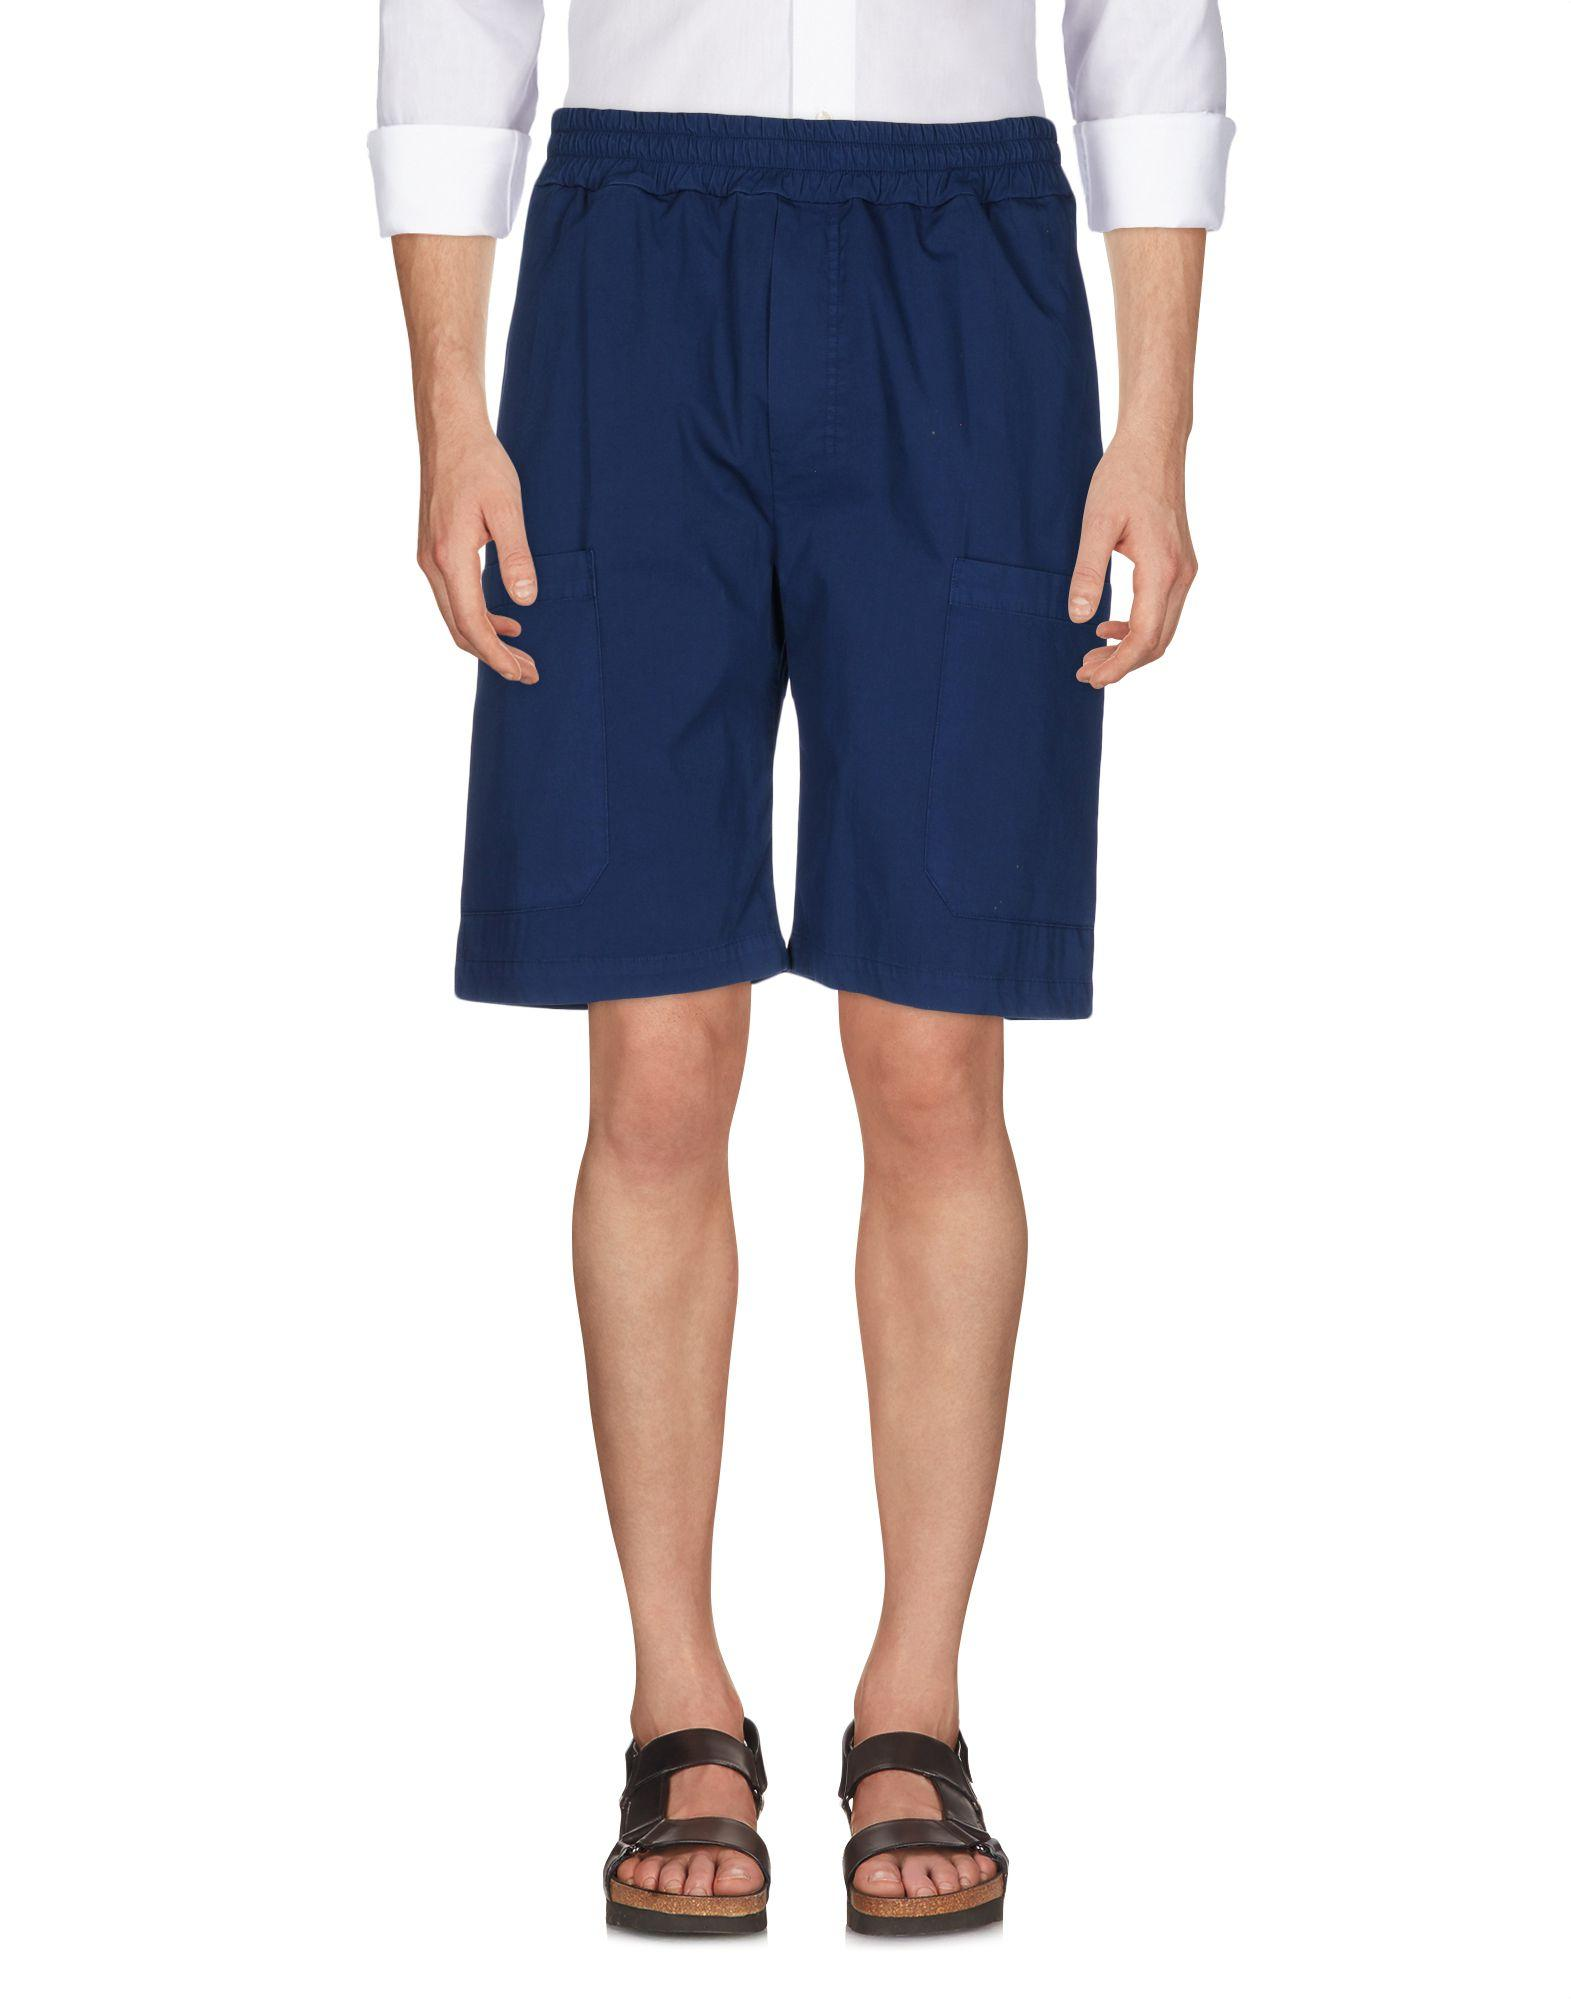 Low Brand Shorts & Bermuda In Dark Blue